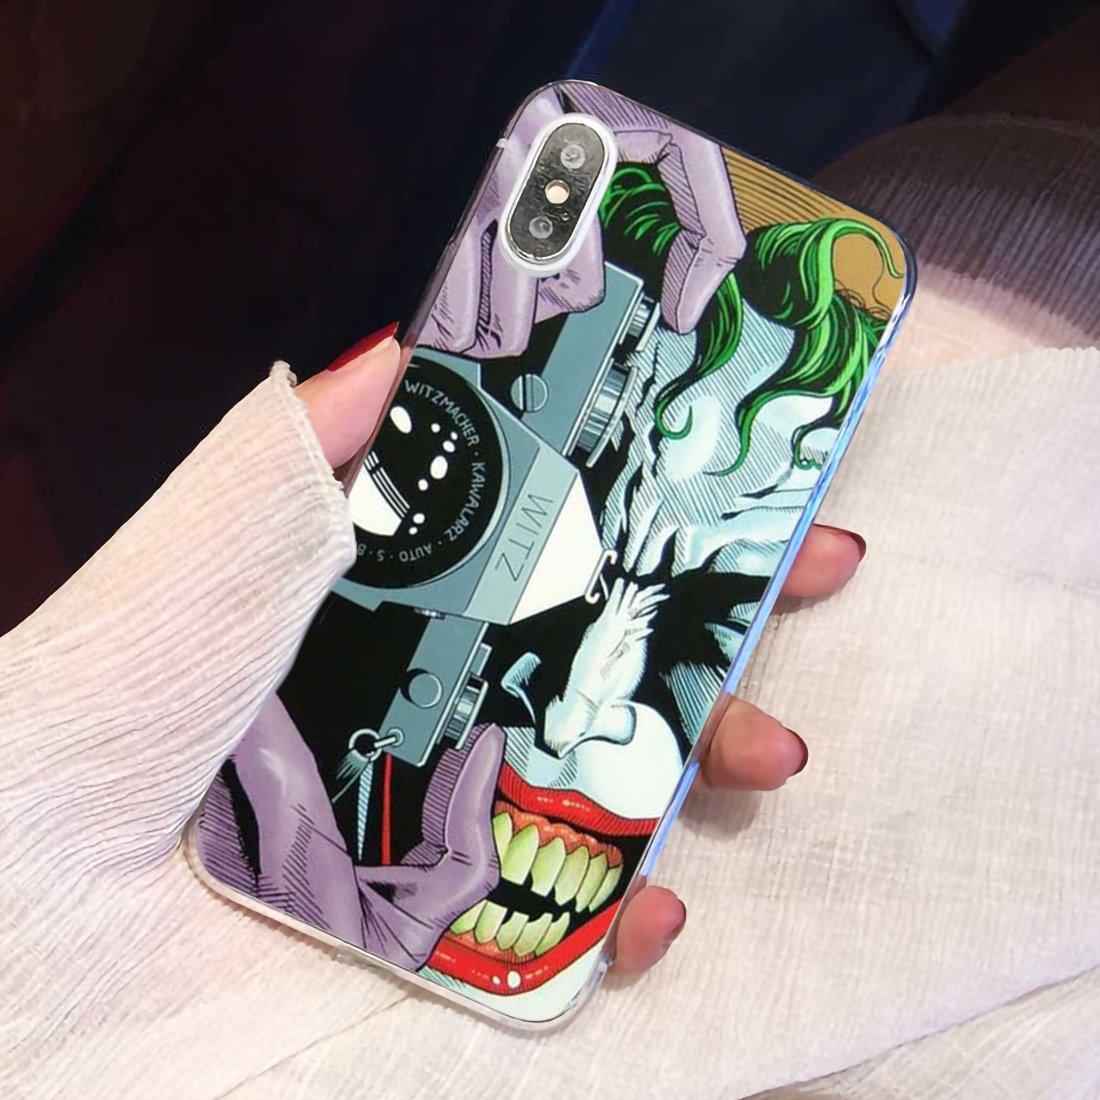 Batman comando suicida Joker suave de TPU para Samsung Galaxy nota 2 3 4 5 8 9 S2 S3 S4 S5 Mini S6 S7 borde S8 S9 Plus